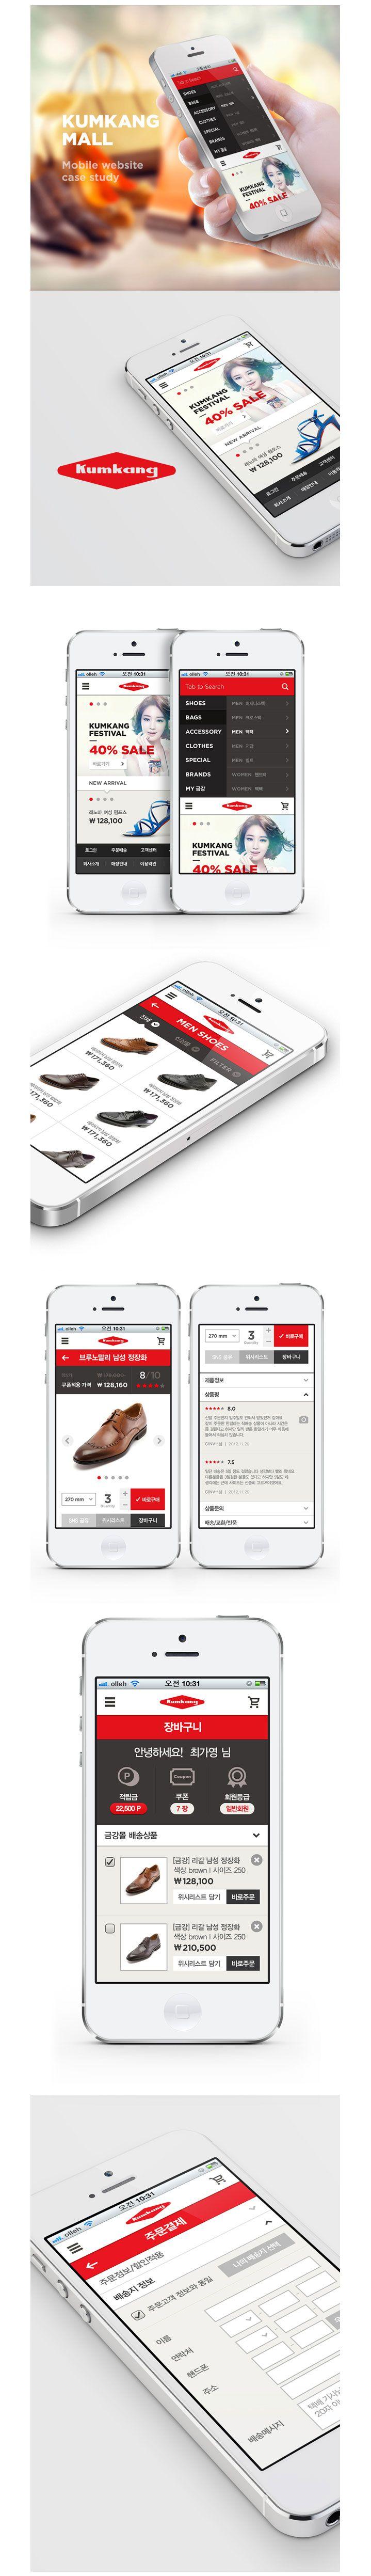 Kumkang mall mobile website